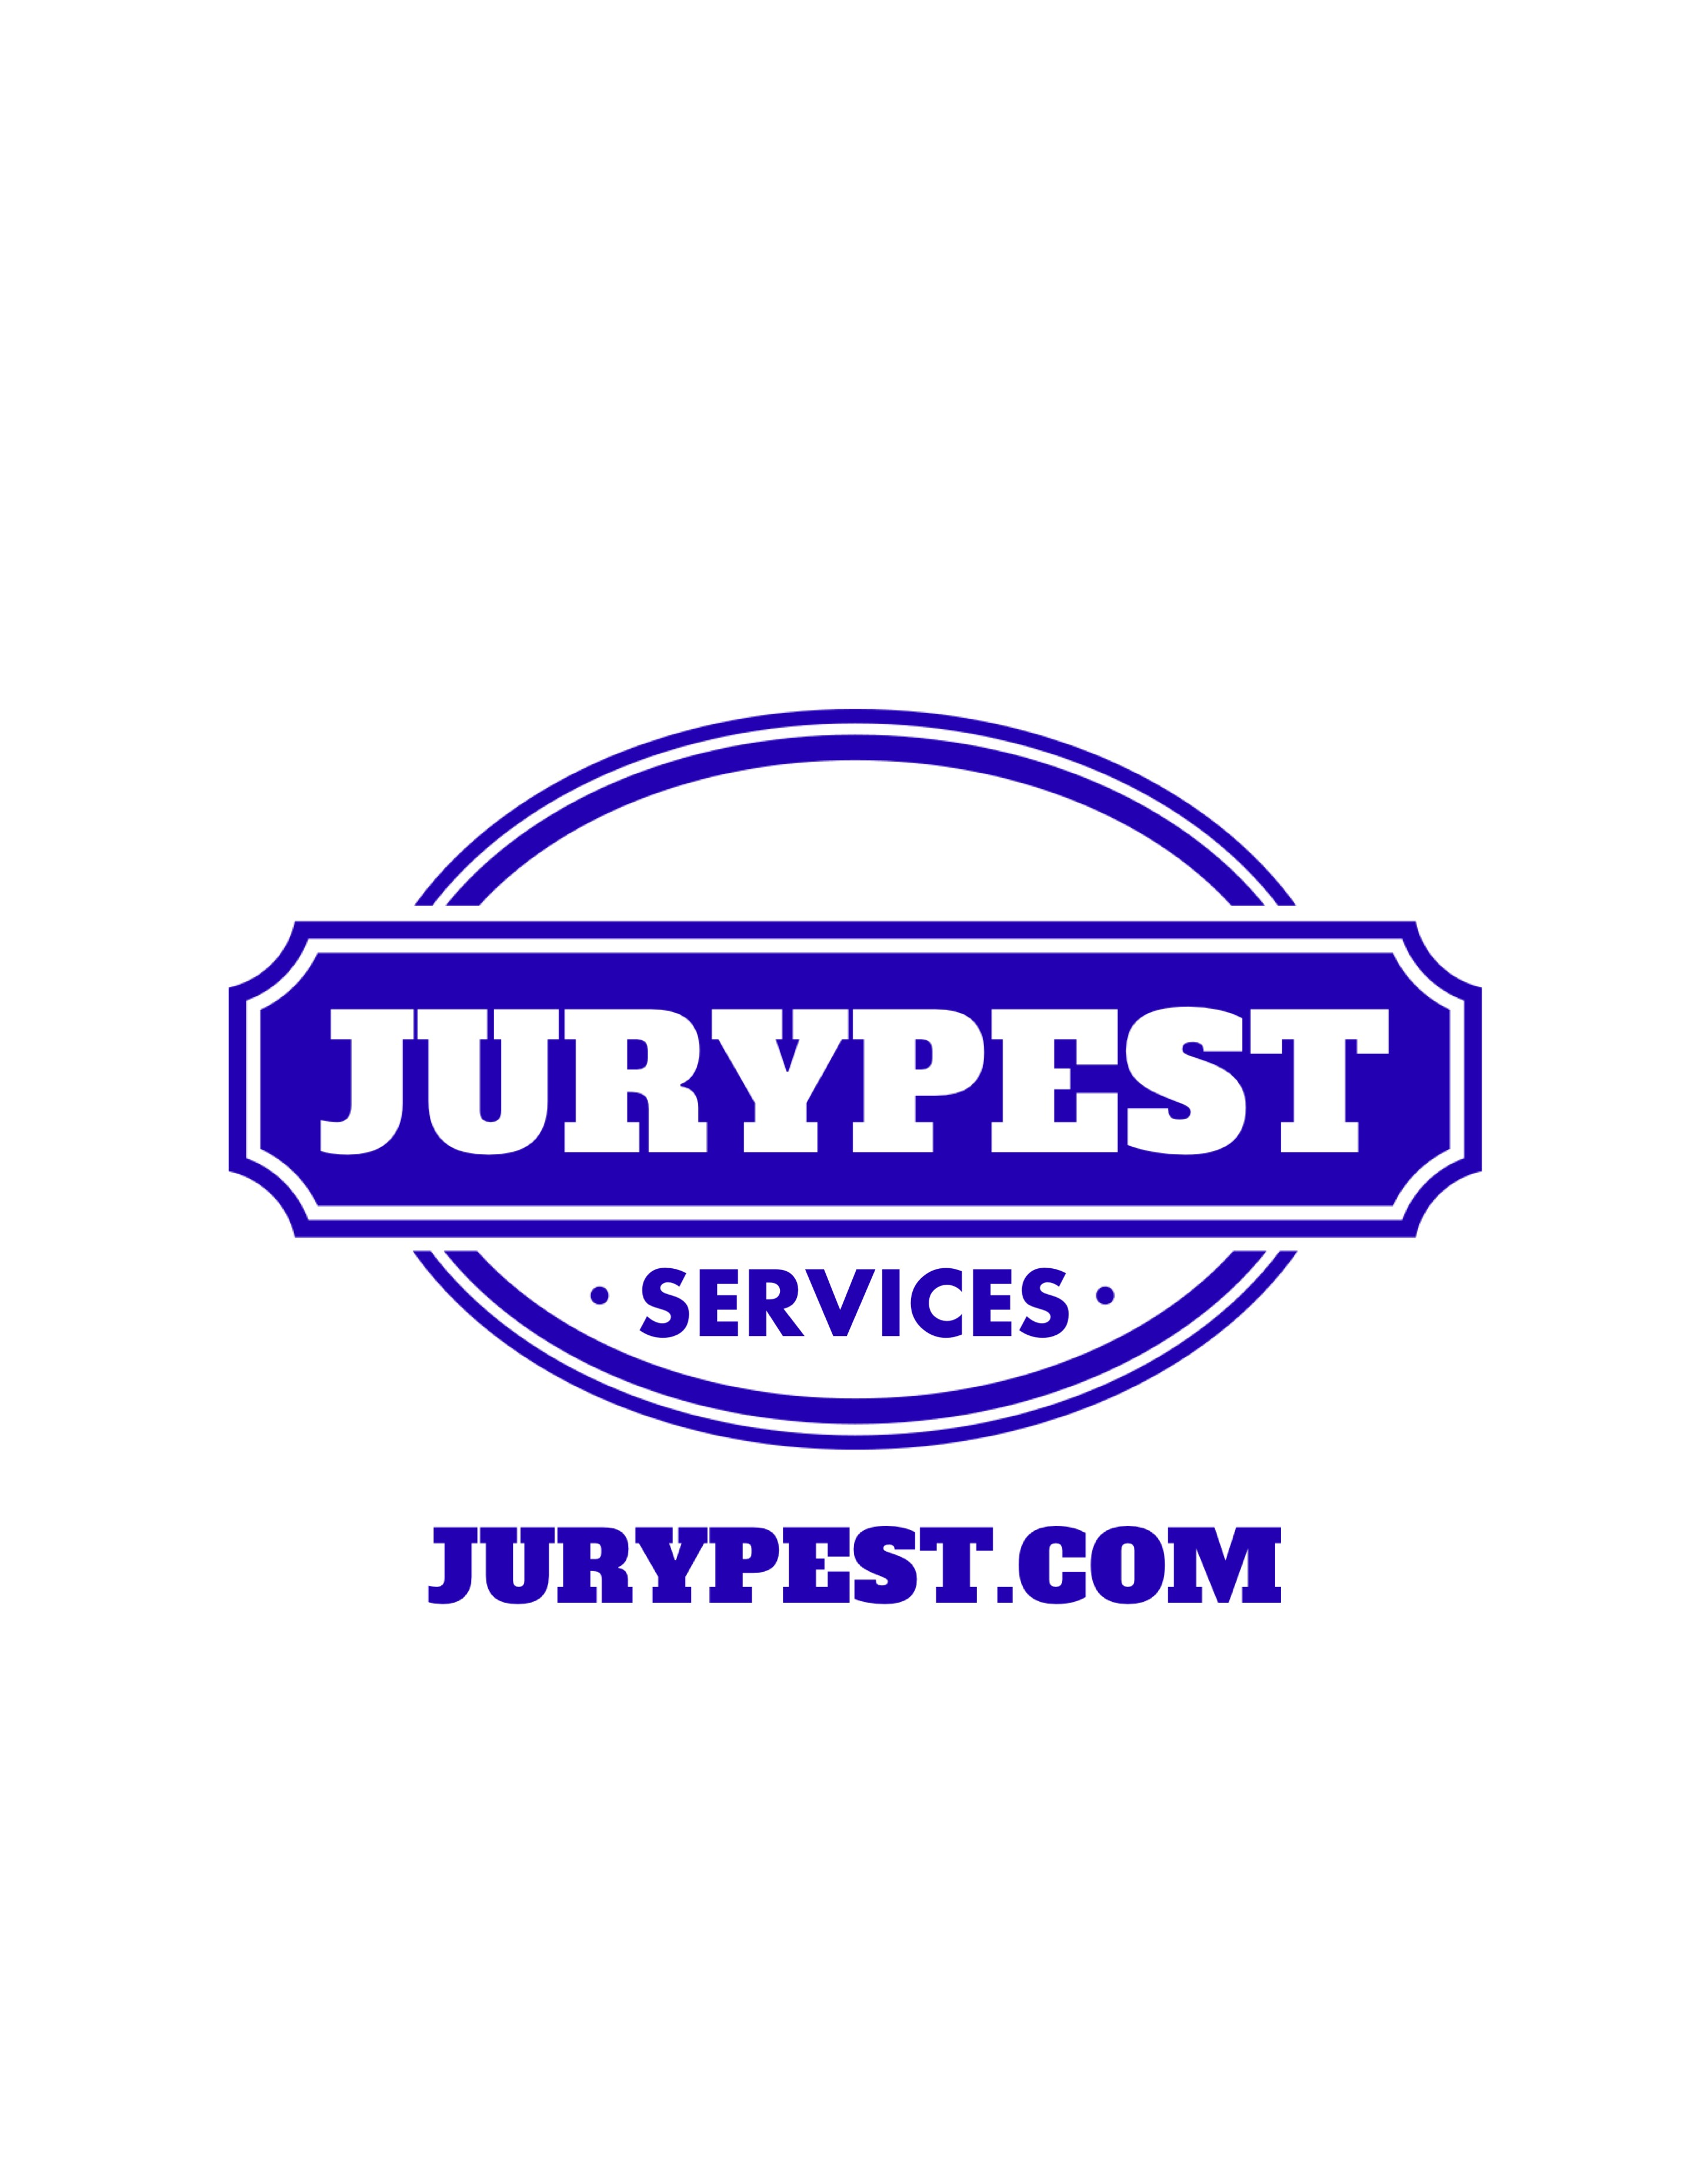 Jury Pest Services